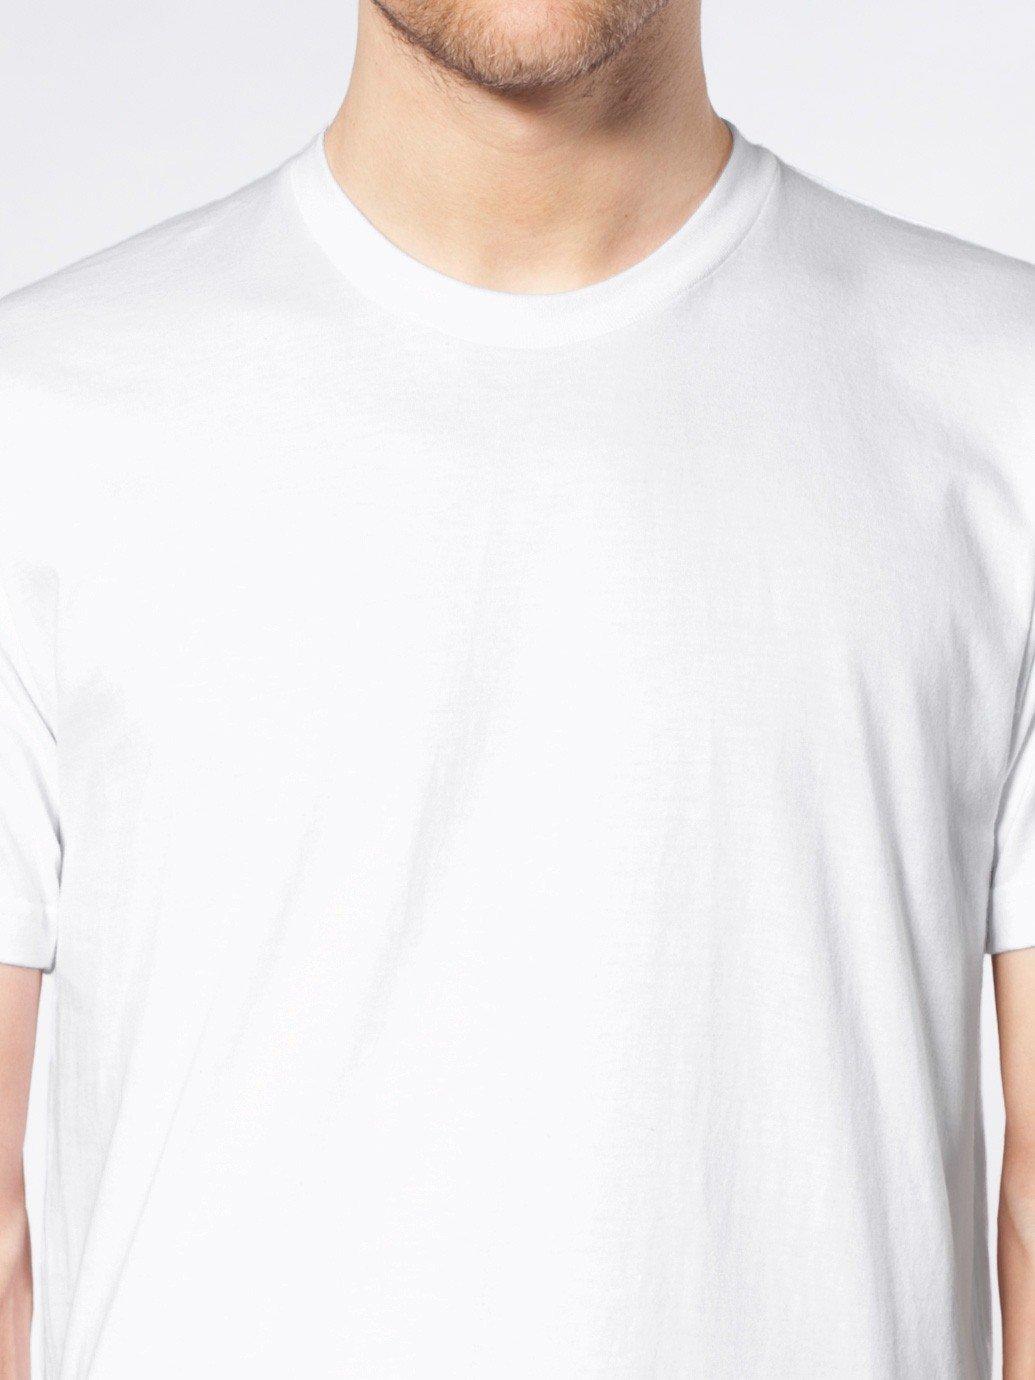 American apparel organic fine jersey short sleeve t shirt for American apparel fine jersey crewneck t shirt